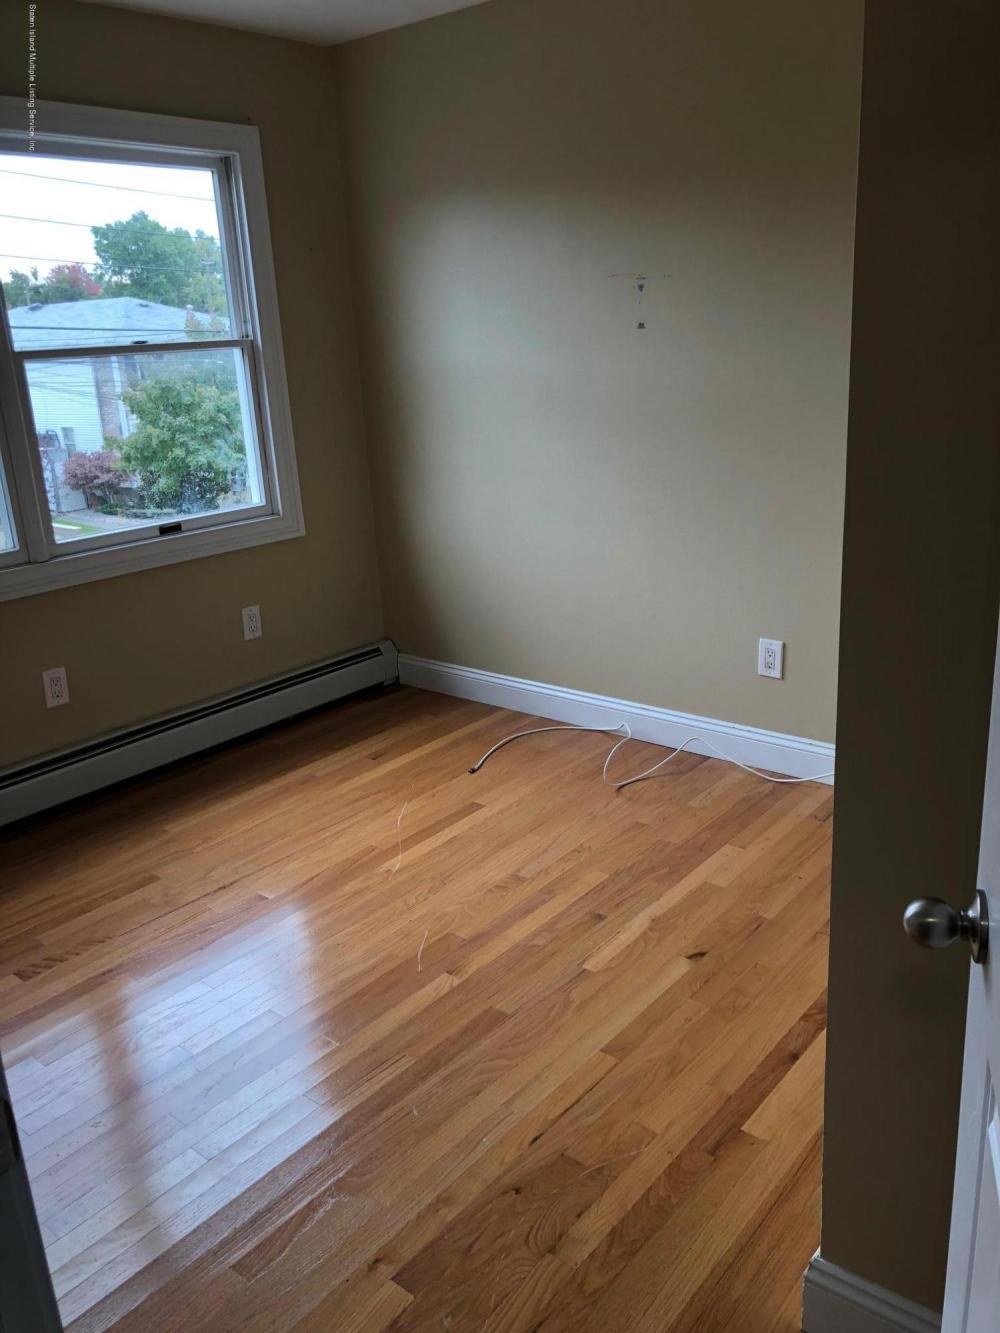 47 Balsam Place,Staten Island,New York,10309,United States,6 Bedrooms Bedrooms,8 Rooms Rooms,4 BathroomsBathrooms,Residential,Balsam,1123805